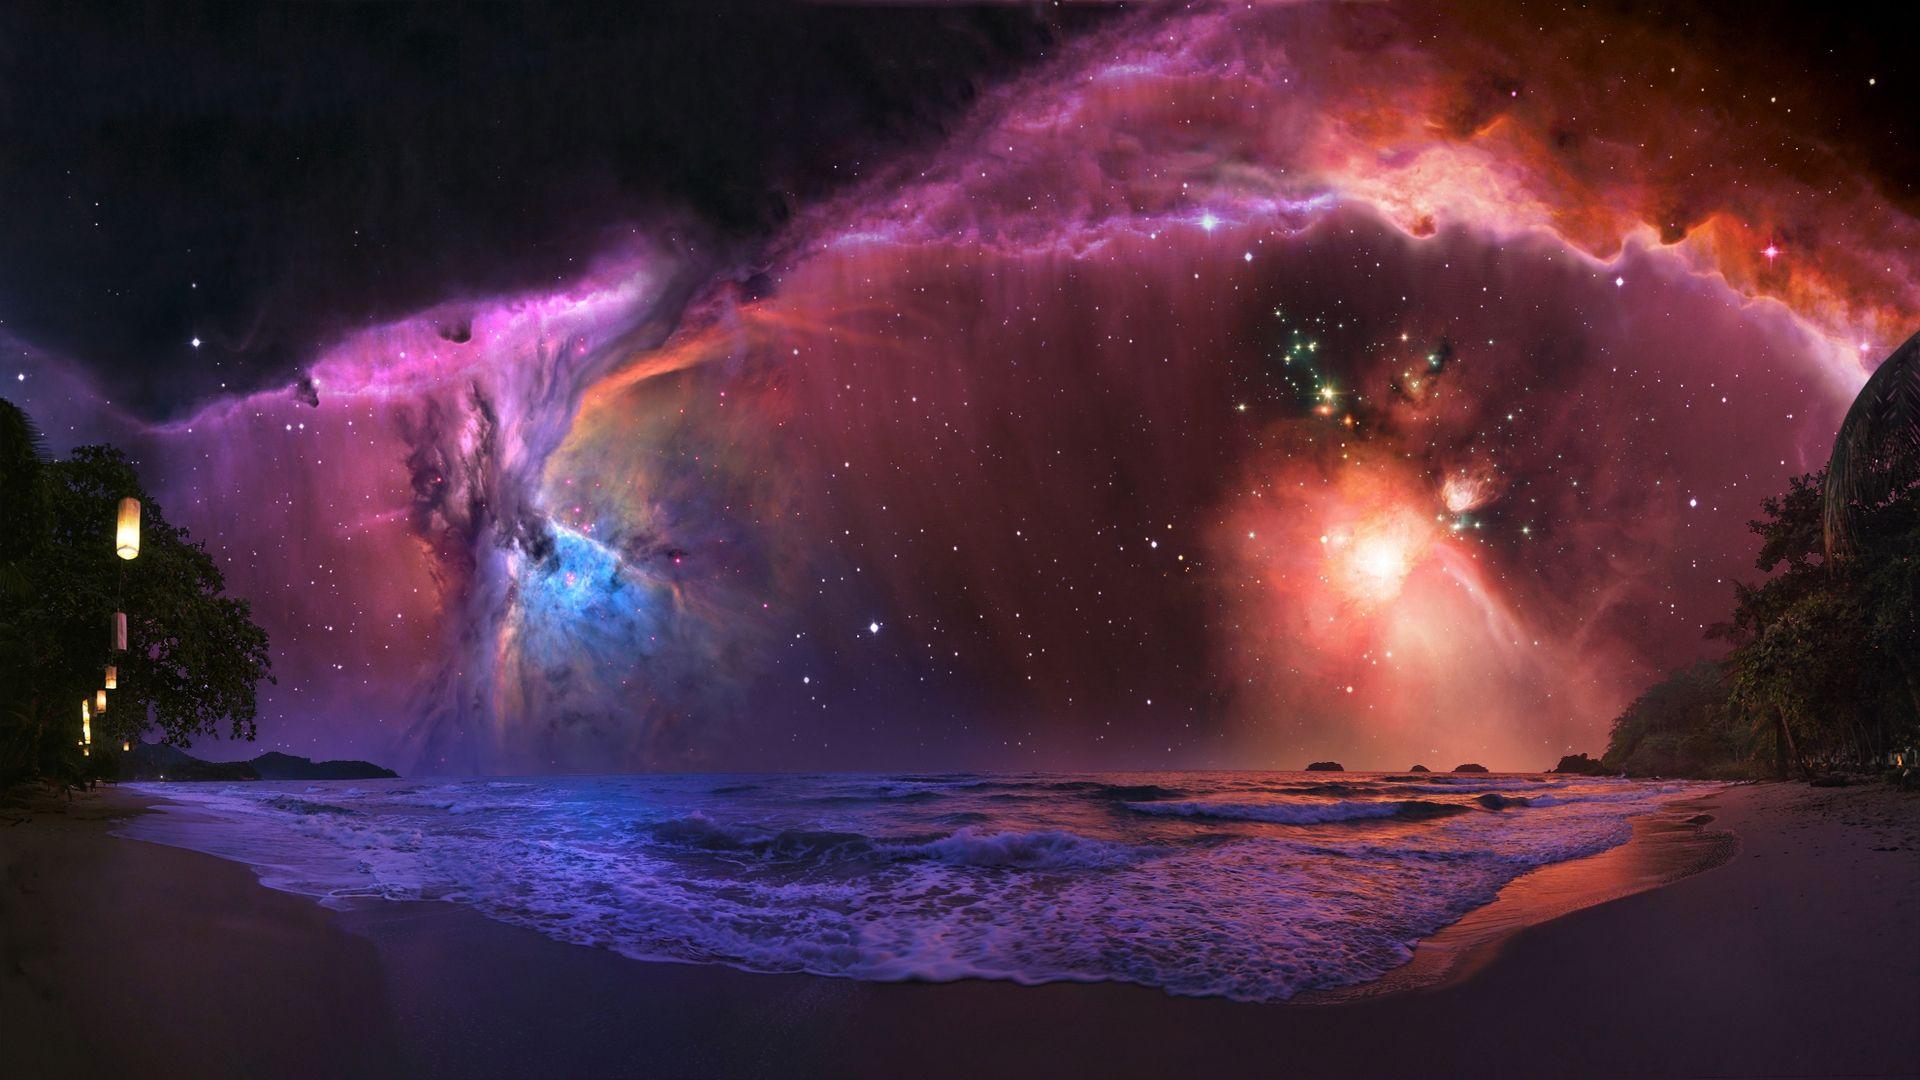 Beautiful Images Beautiful Nature Desktop Wallpaper Wallpapers Walls 661126 Nebula Wallpaper Hd Galaxy Wallpaper Galaxy Wallpaper